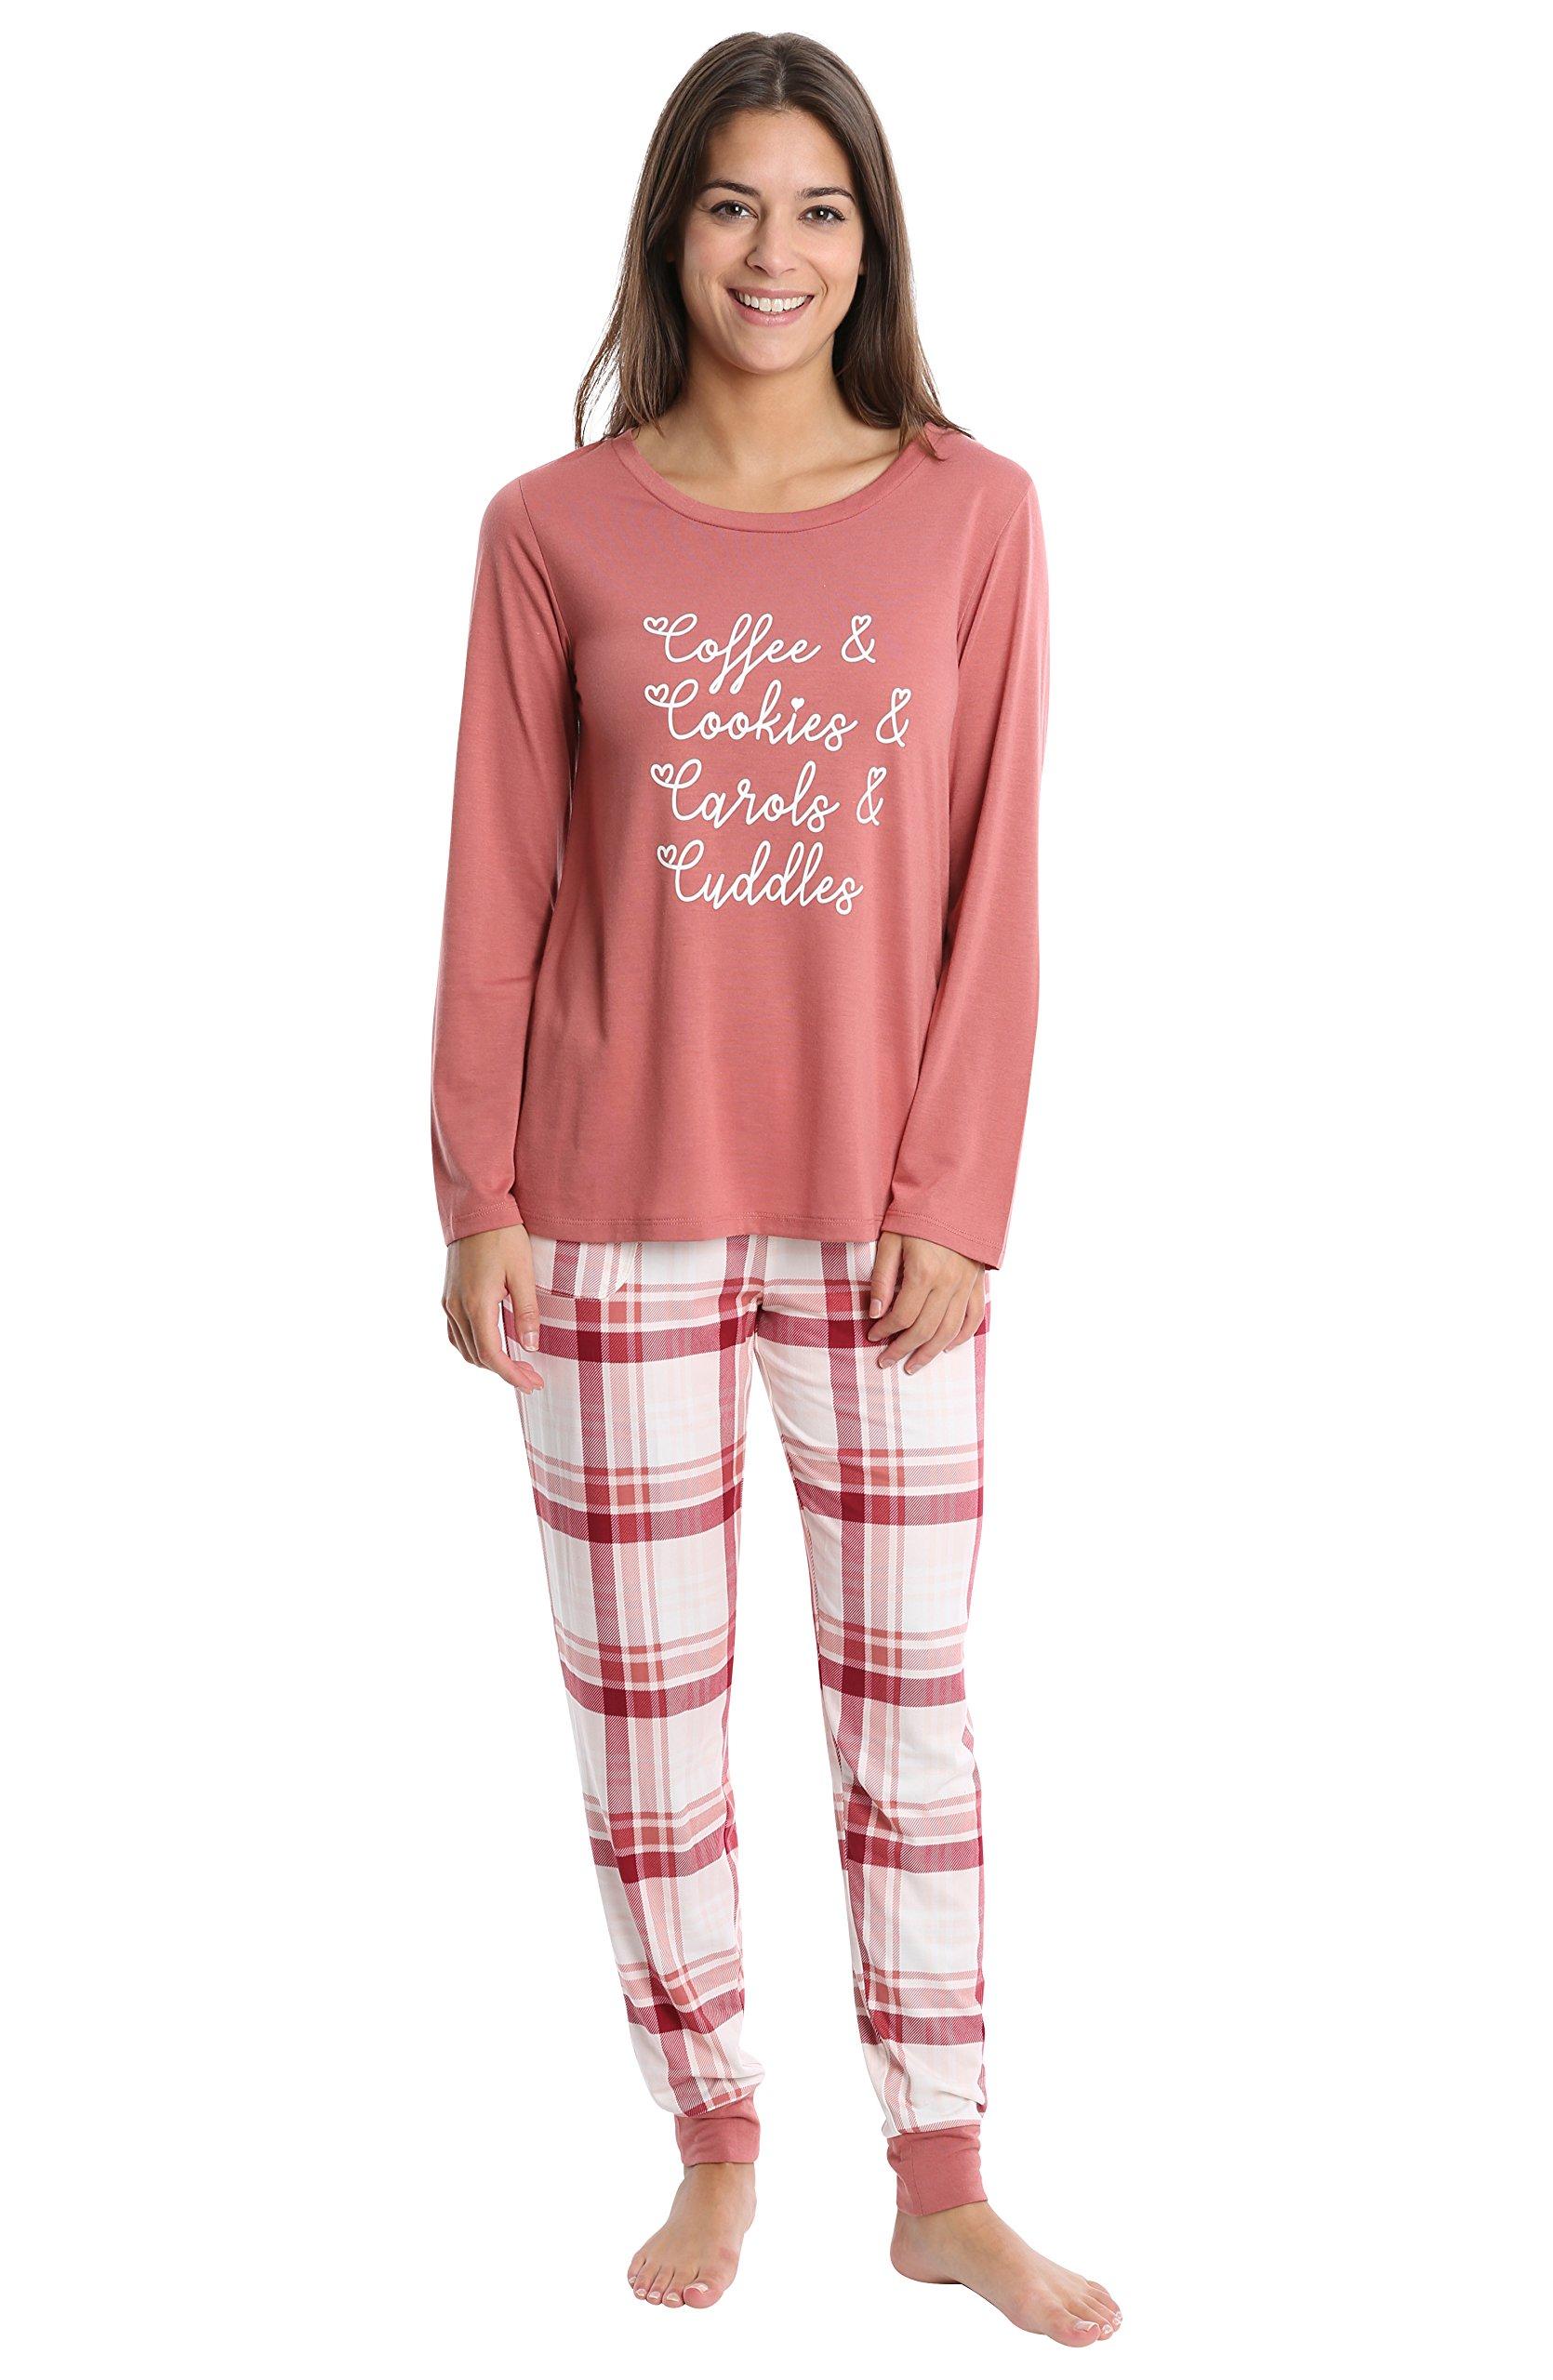 WallFlower Women's Pajama Pant Set - Long Sleeve Sleep Shirt & PJ Lounge Bottoms - Canyon Tulip W. Red and Blush Plaid, Medium